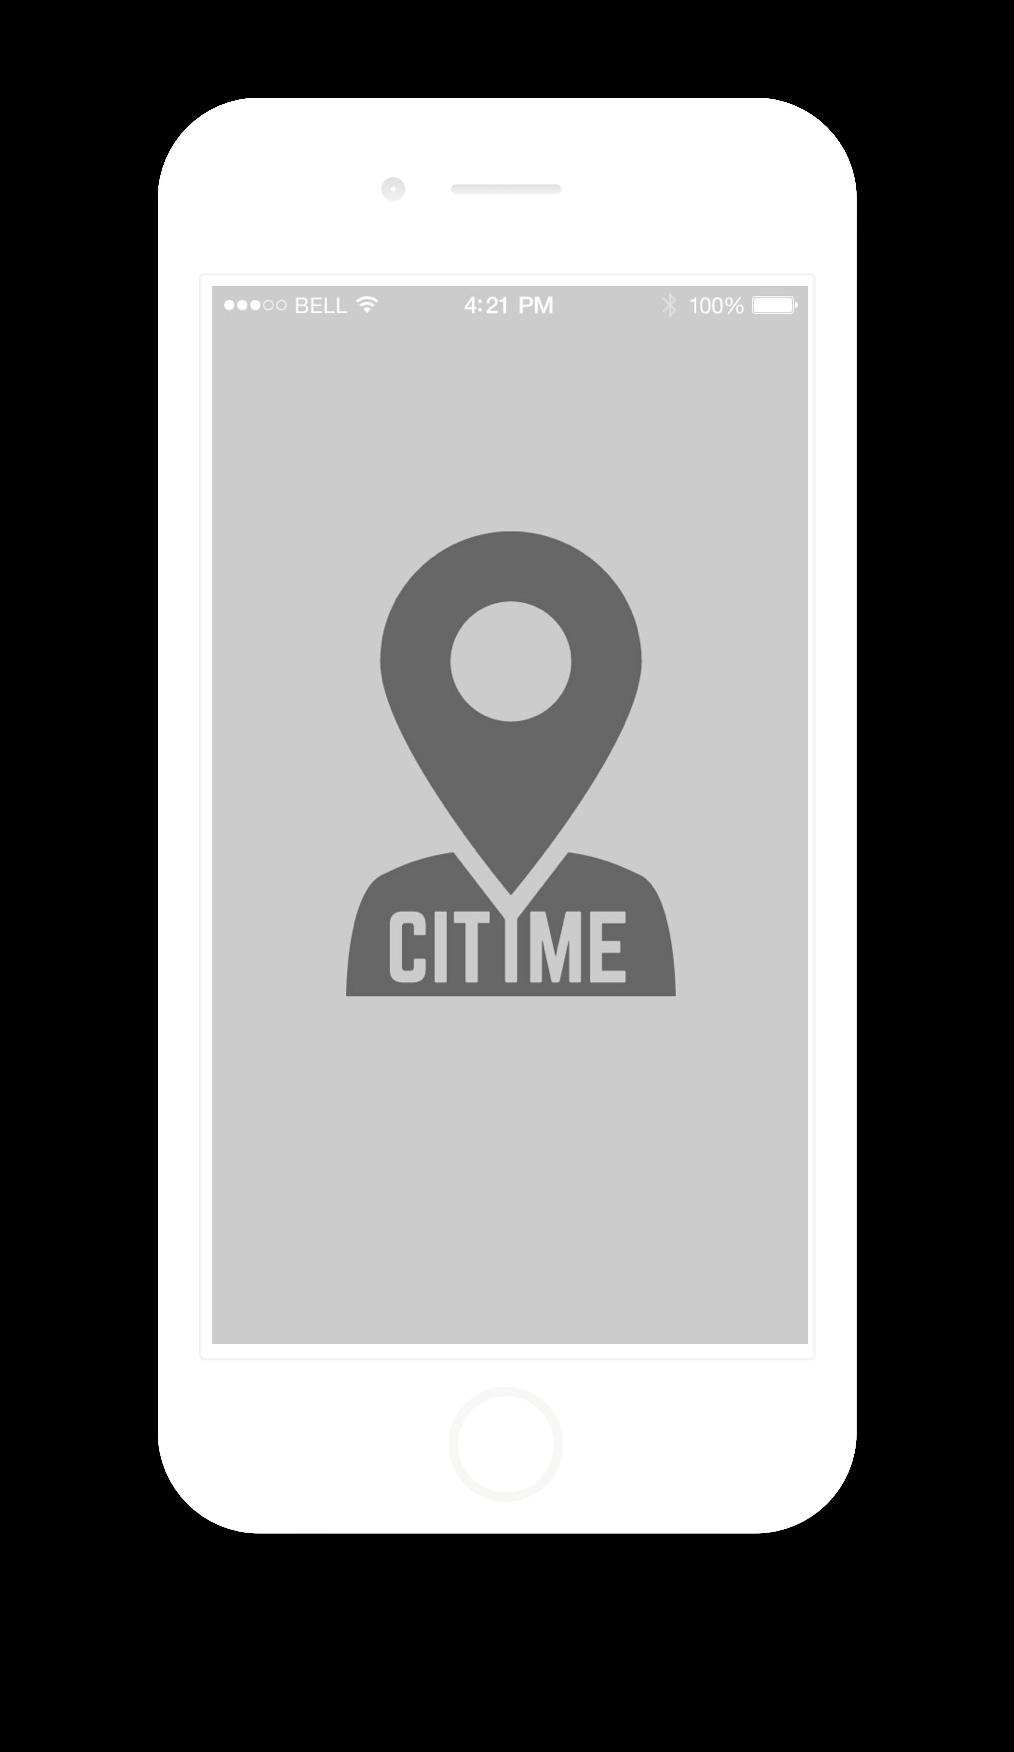 cityme-2